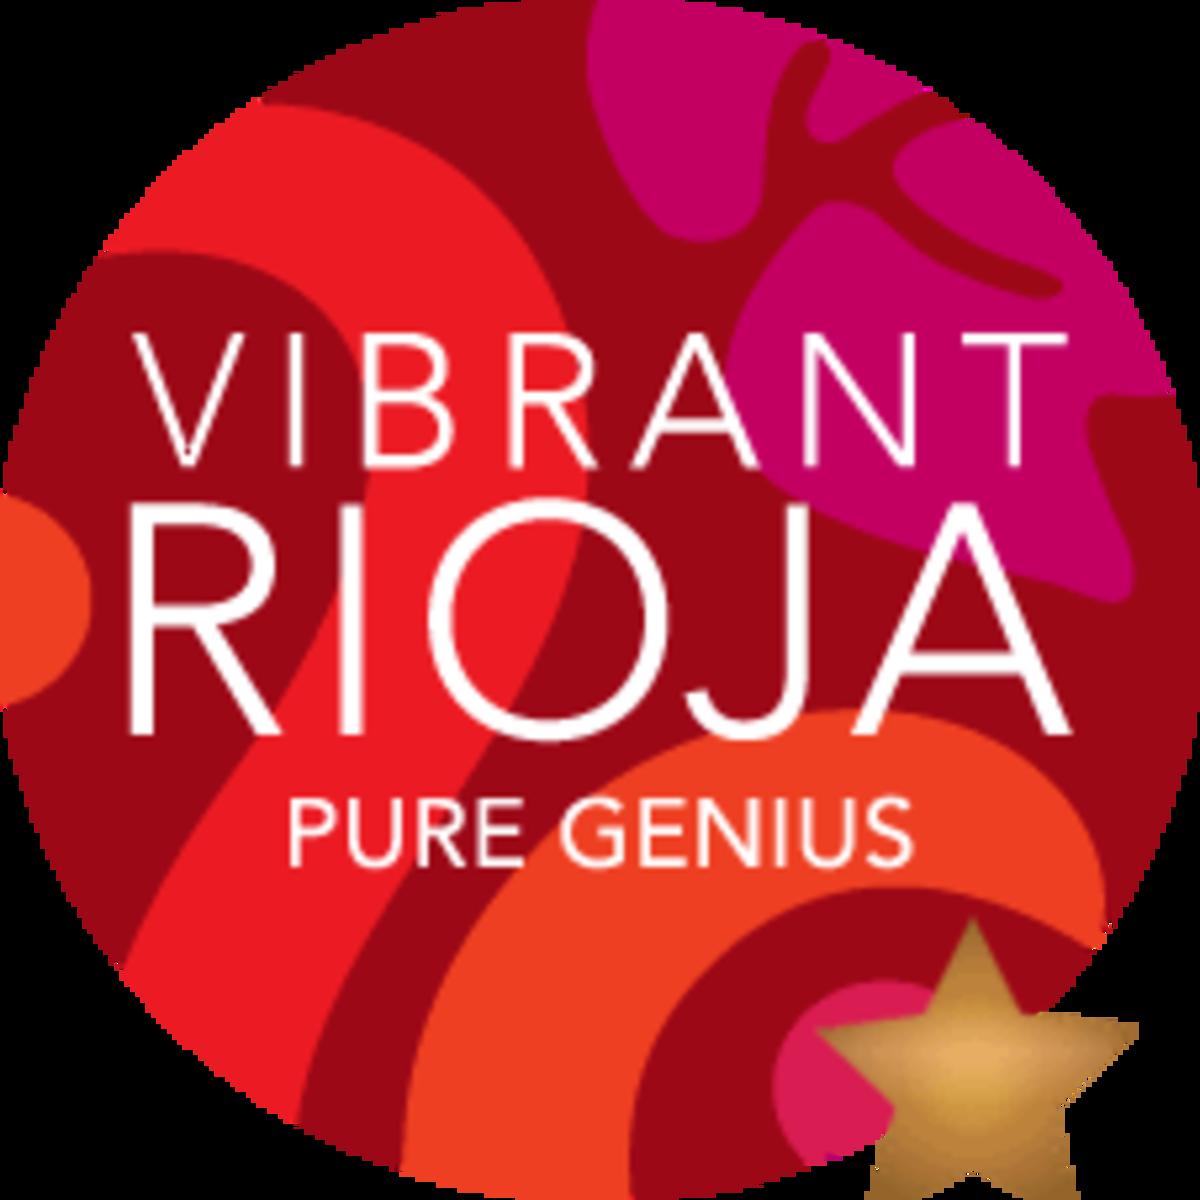 Vibrant Rioja, Vibrant Rioja for moms